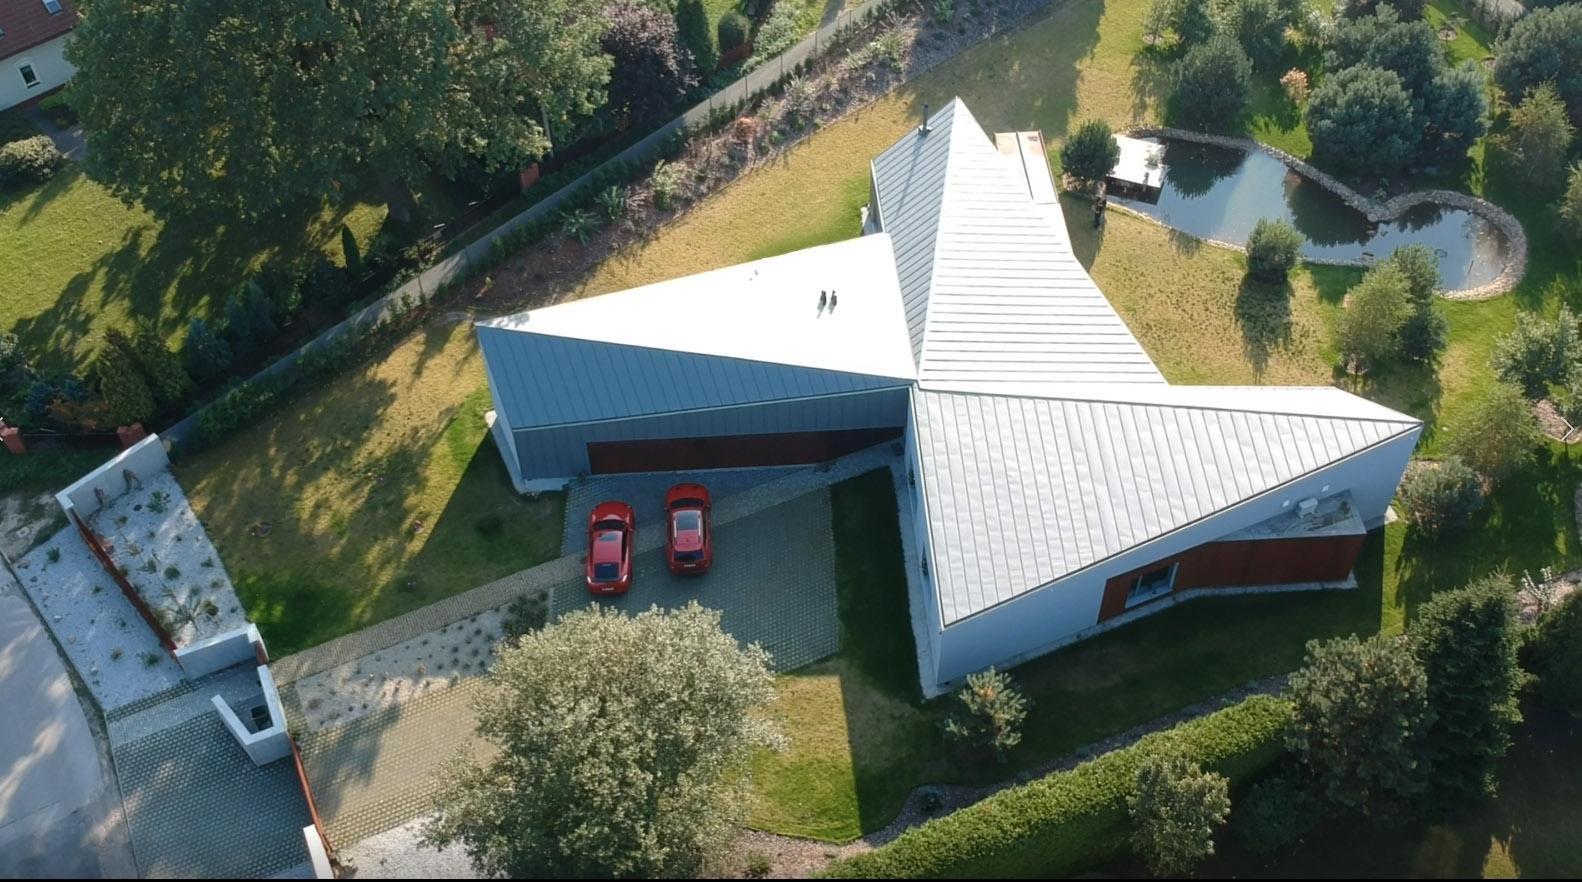 FAN-CY-HOUSE – dom inspirowany wiatrakiem